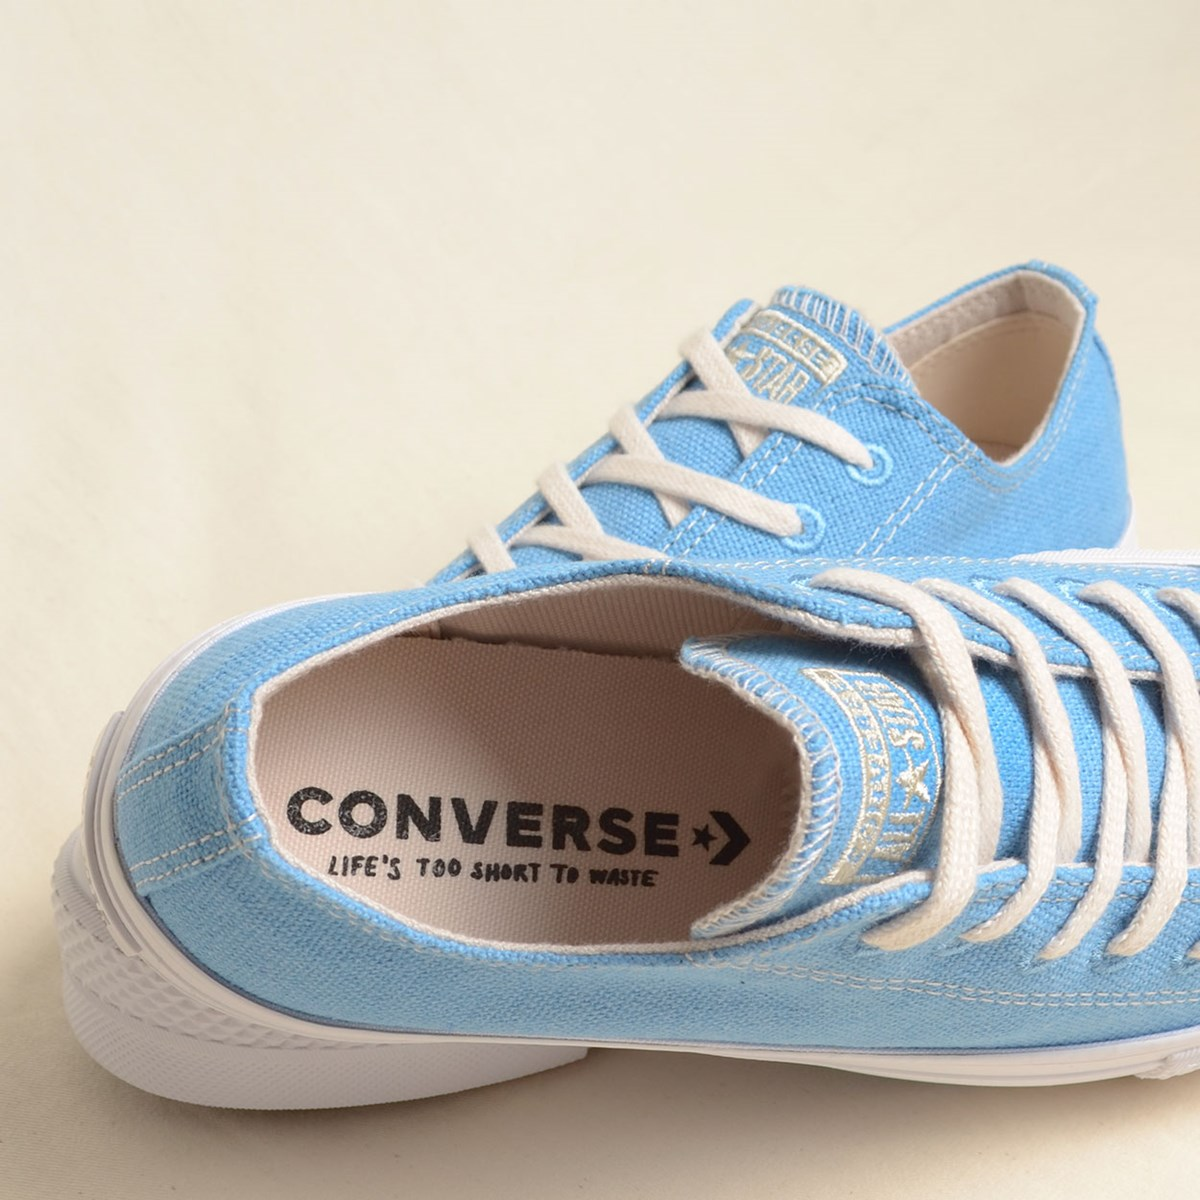 Tênis Converse Chuck Taylor All Star Renew Lift Platform Ox Coast White 567105C